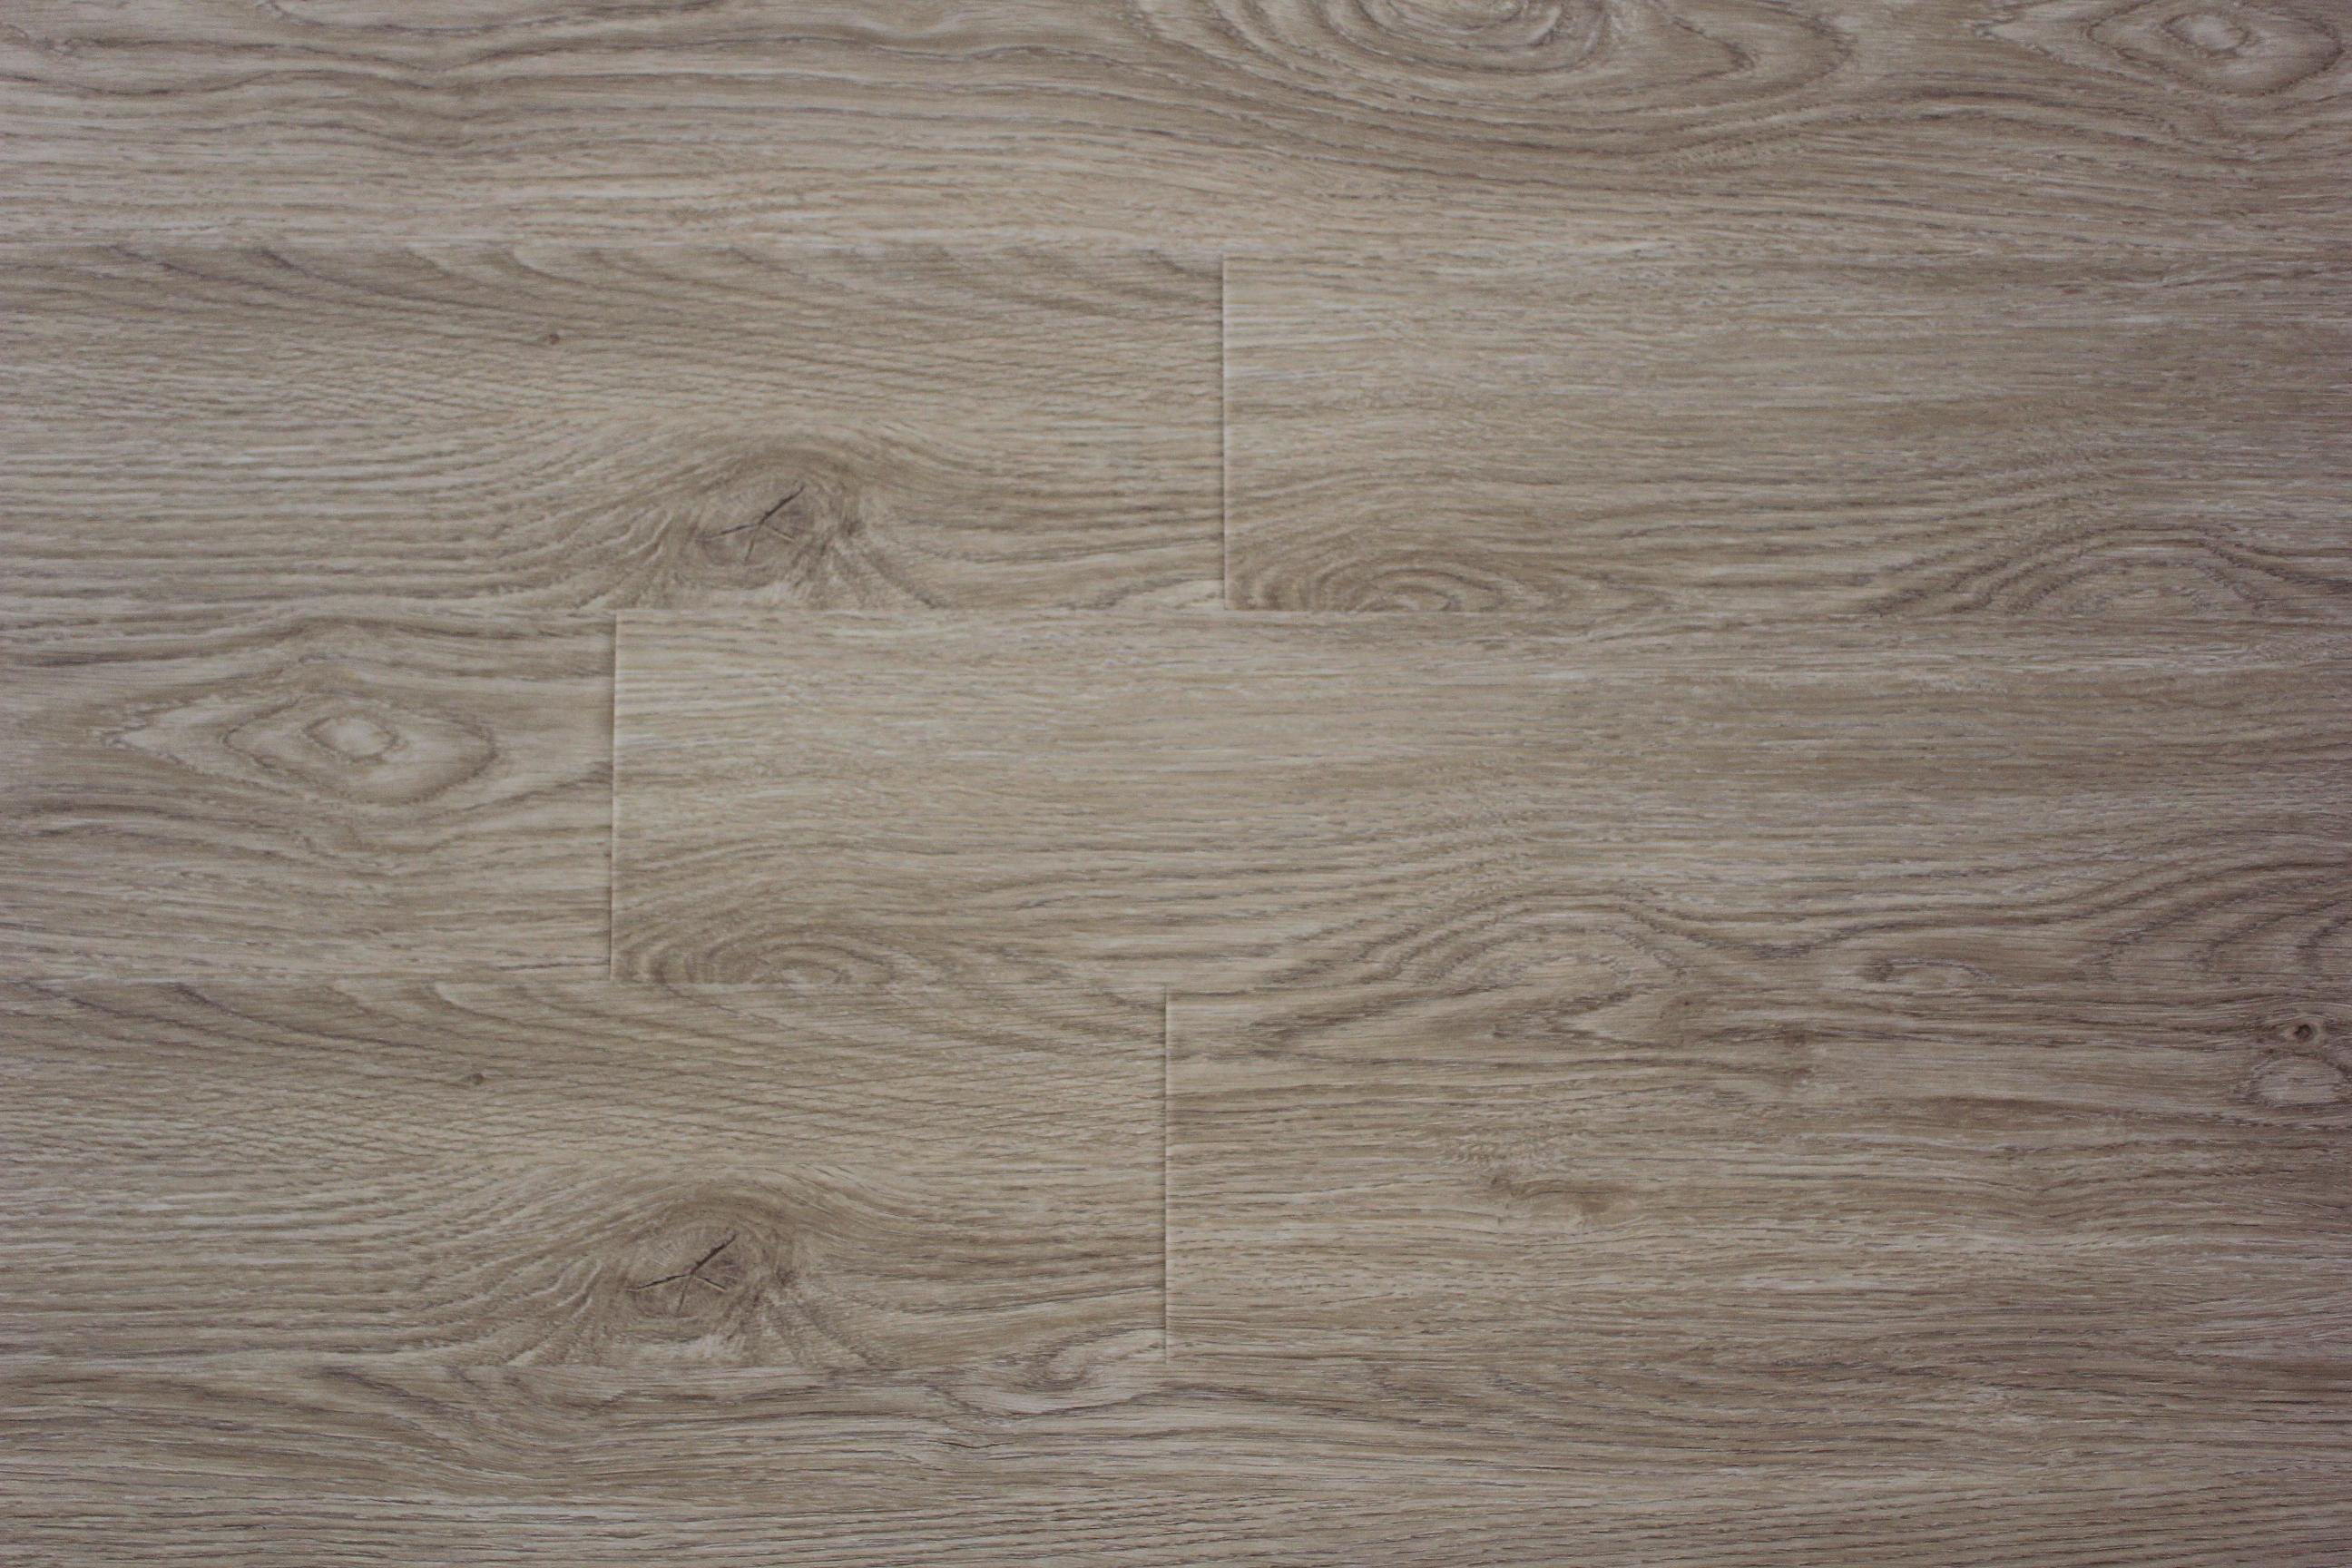 Floorwood Real 72782 Дуб Шотландский